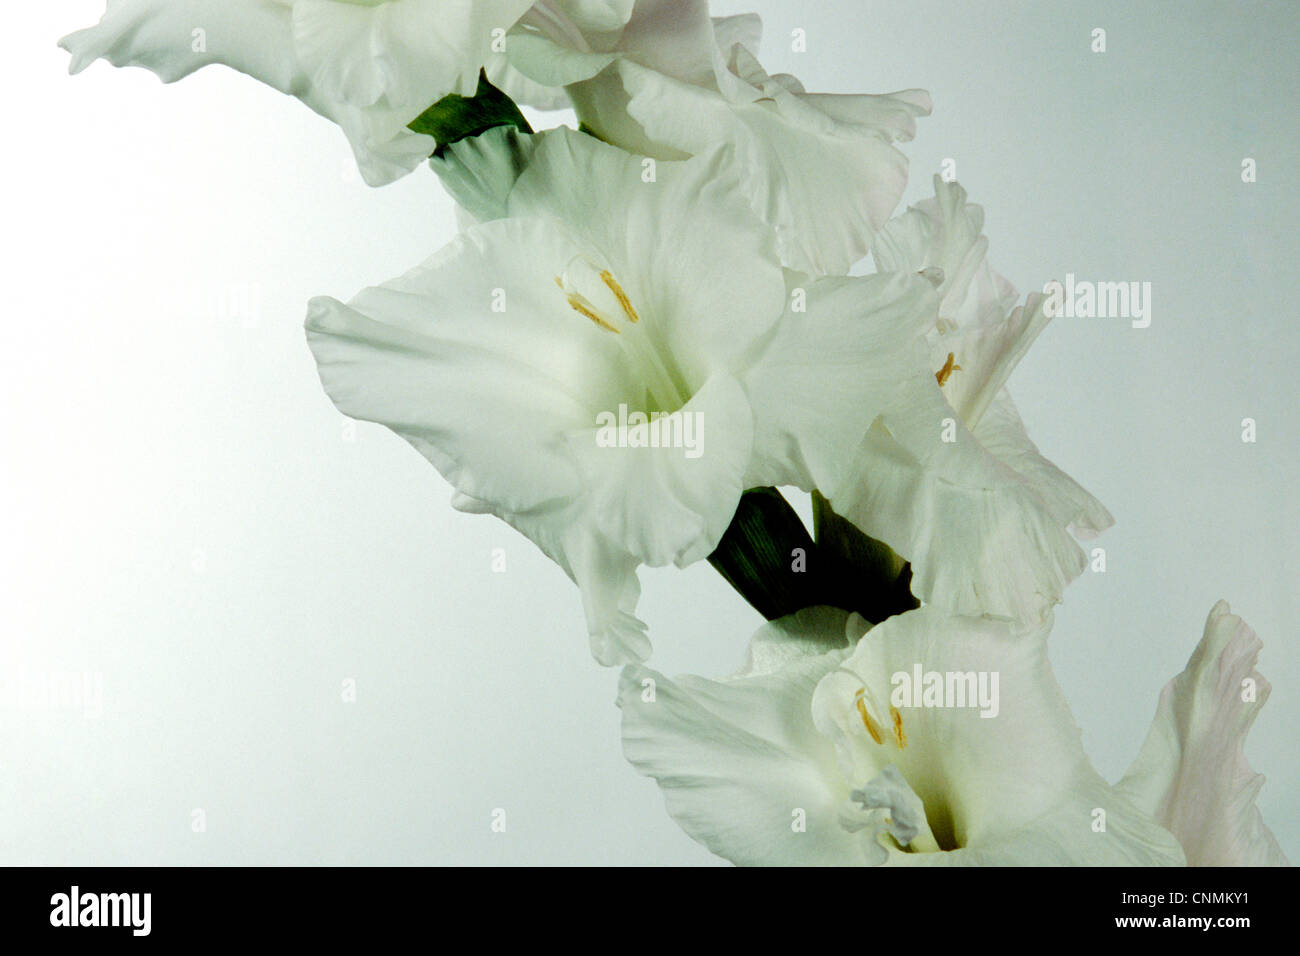 Close up white gladiolus flowers stock photos close up white white gladiolus flowers stock image mightylinksfo